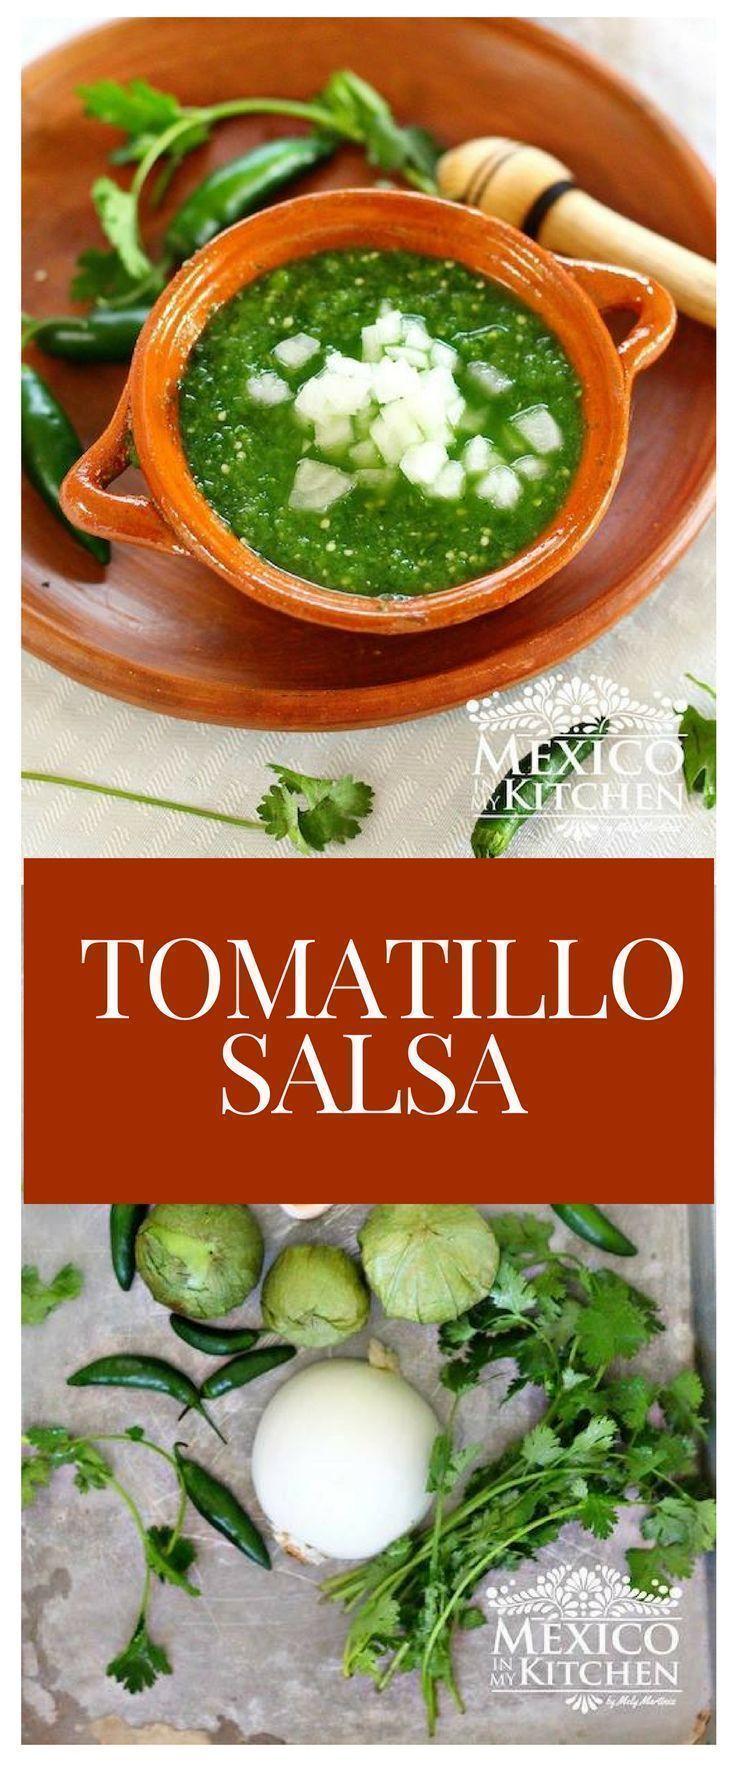 #mexicancuisine #mexicanrecipes #asadarecipe #tomatillo #barbacoa #carnitas #mexican #salsas #fresh #salsa #pairs #quick #carne #food #thisQuick Fresh Tomatillo Salsa How to make Tomatillo Salsa │This salsa pairs well with carnitas, lamb barbacoa, and carne asada#recipeHow to make Tomatillo Salsa │This salsa pairs well with carnitas, lamb barbacoa, and carne asada#recipe #authenticmexicansalsa #mexicancuisine #mexicanrecipes #asadarecipe #tomatillo #barbacoa #carnitas #mexican #salsas #fresh #authenticmexicansalsa